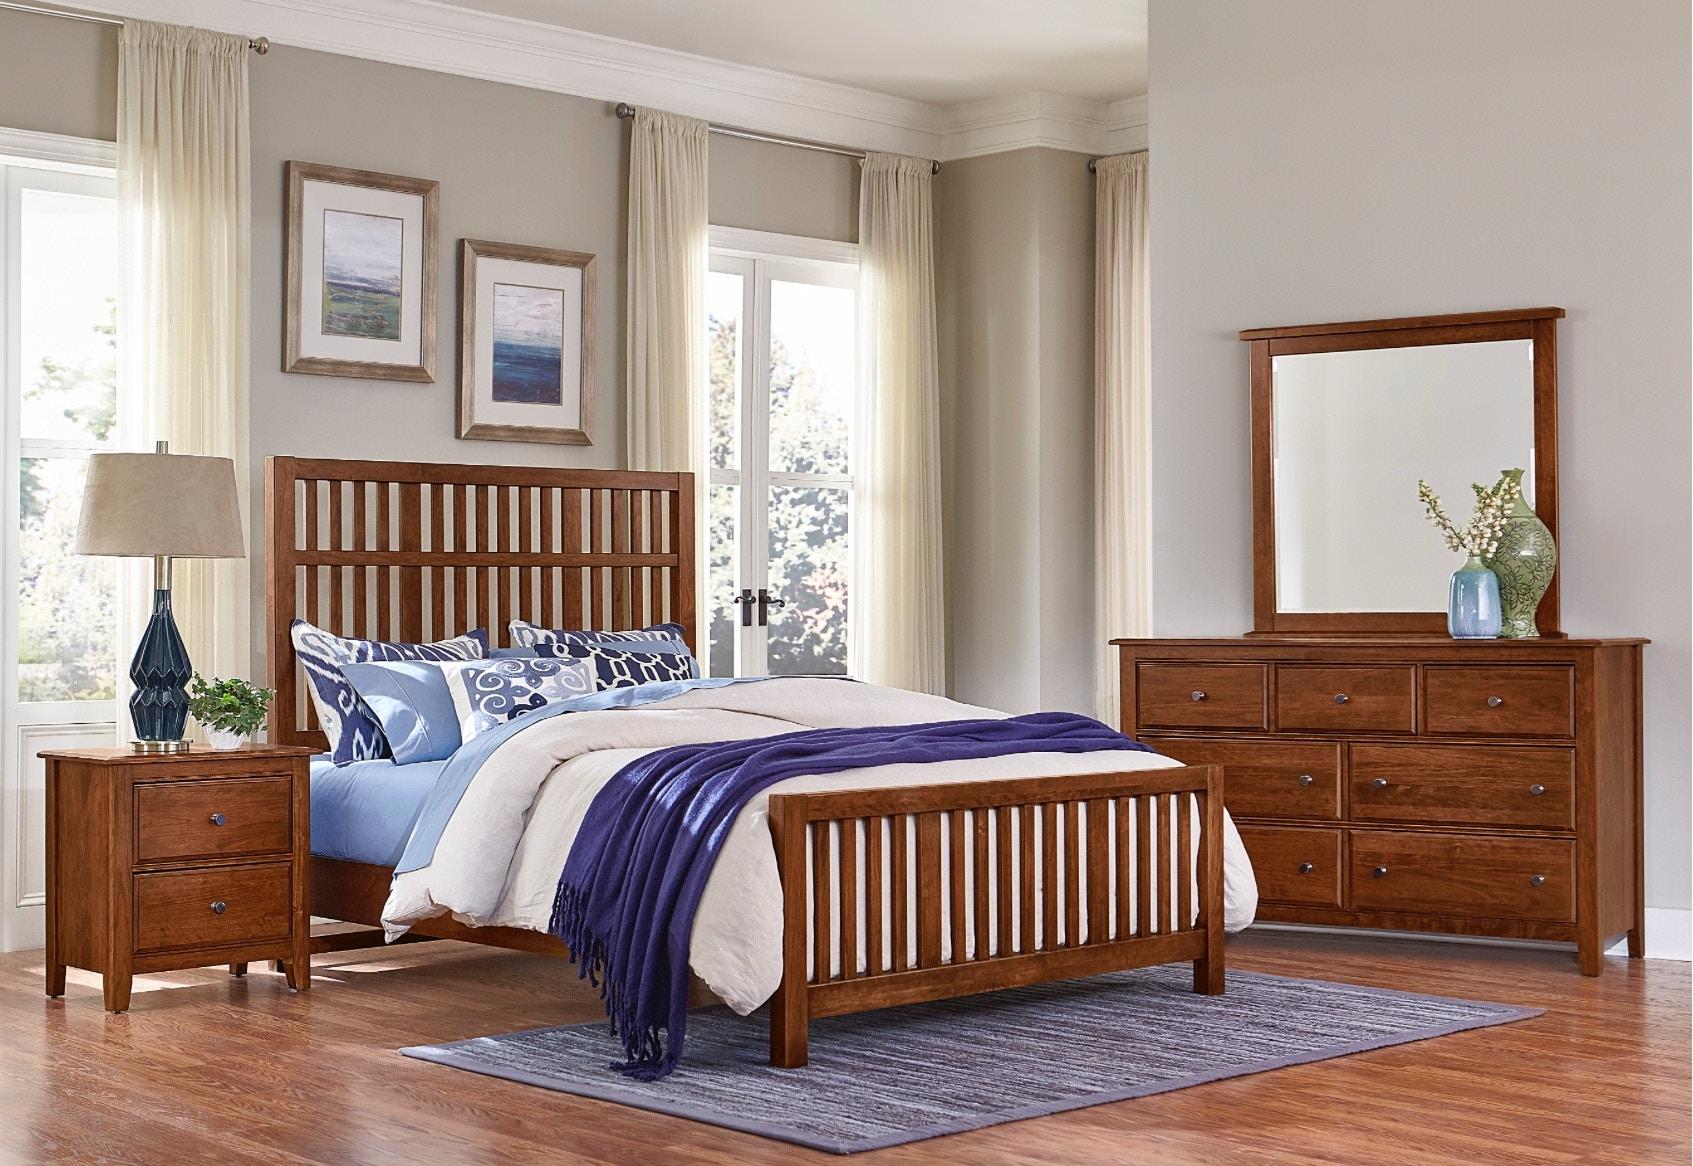 Vaughan Bassett Furniture Company Artisan U0026 Post Villa Craftsman Bedroom Set